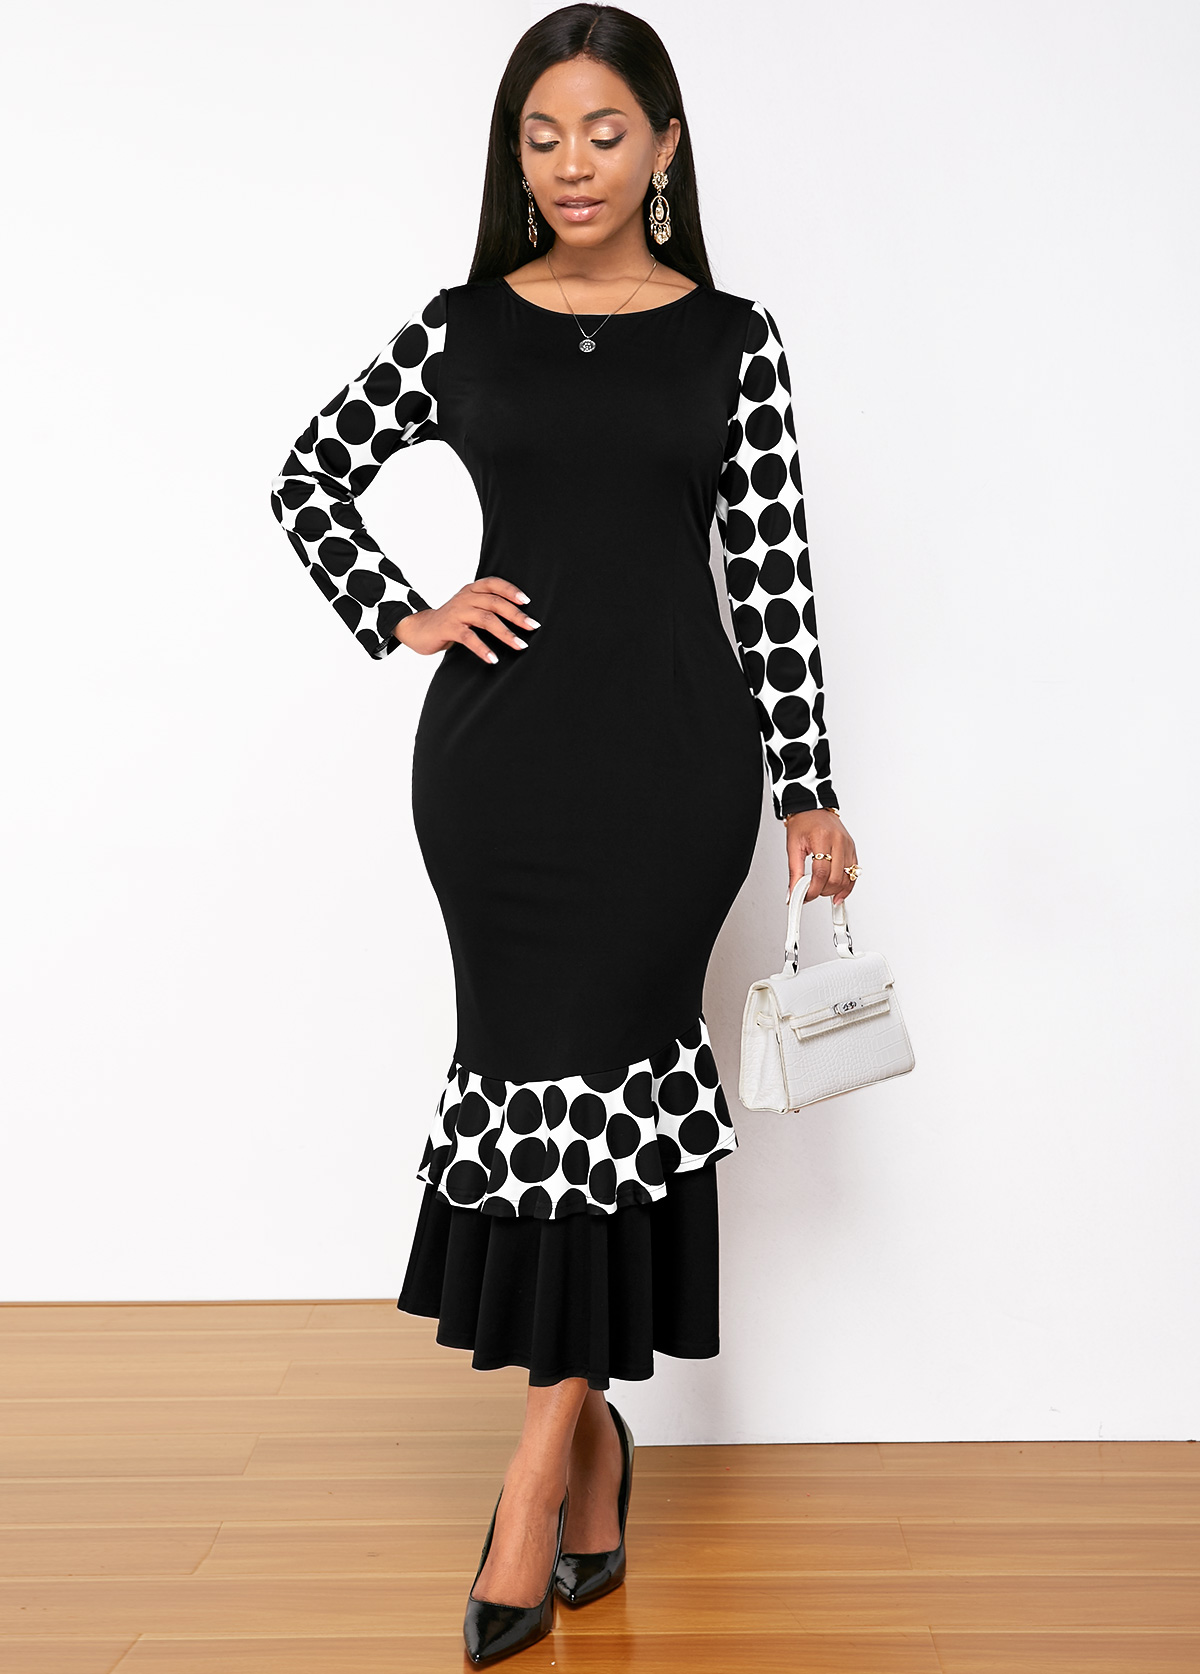 ROTITA Long Sleeve Polka Dot Print Round Neck Mermaid Dress